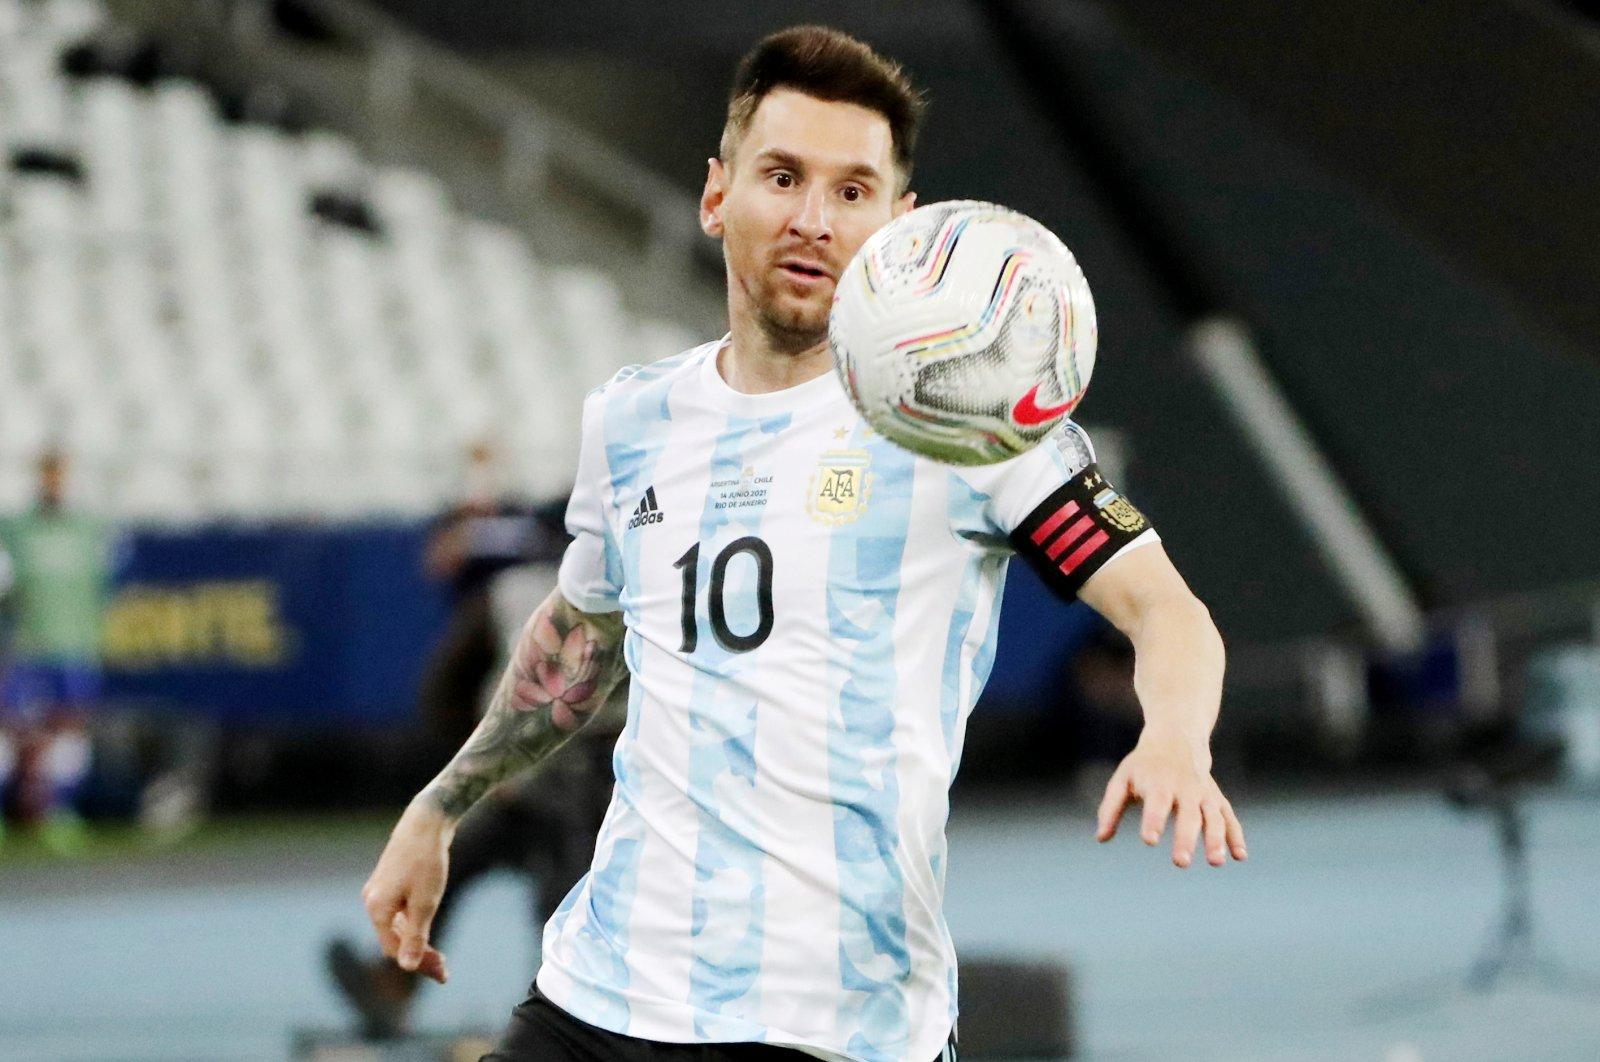 Argentina's Lionel Messi in action during a Copa America Group A match against Chile, Estadio Nilton Santos, Rio de Janeiro, Brazil, June 14, 2021. (Reuters Photo)